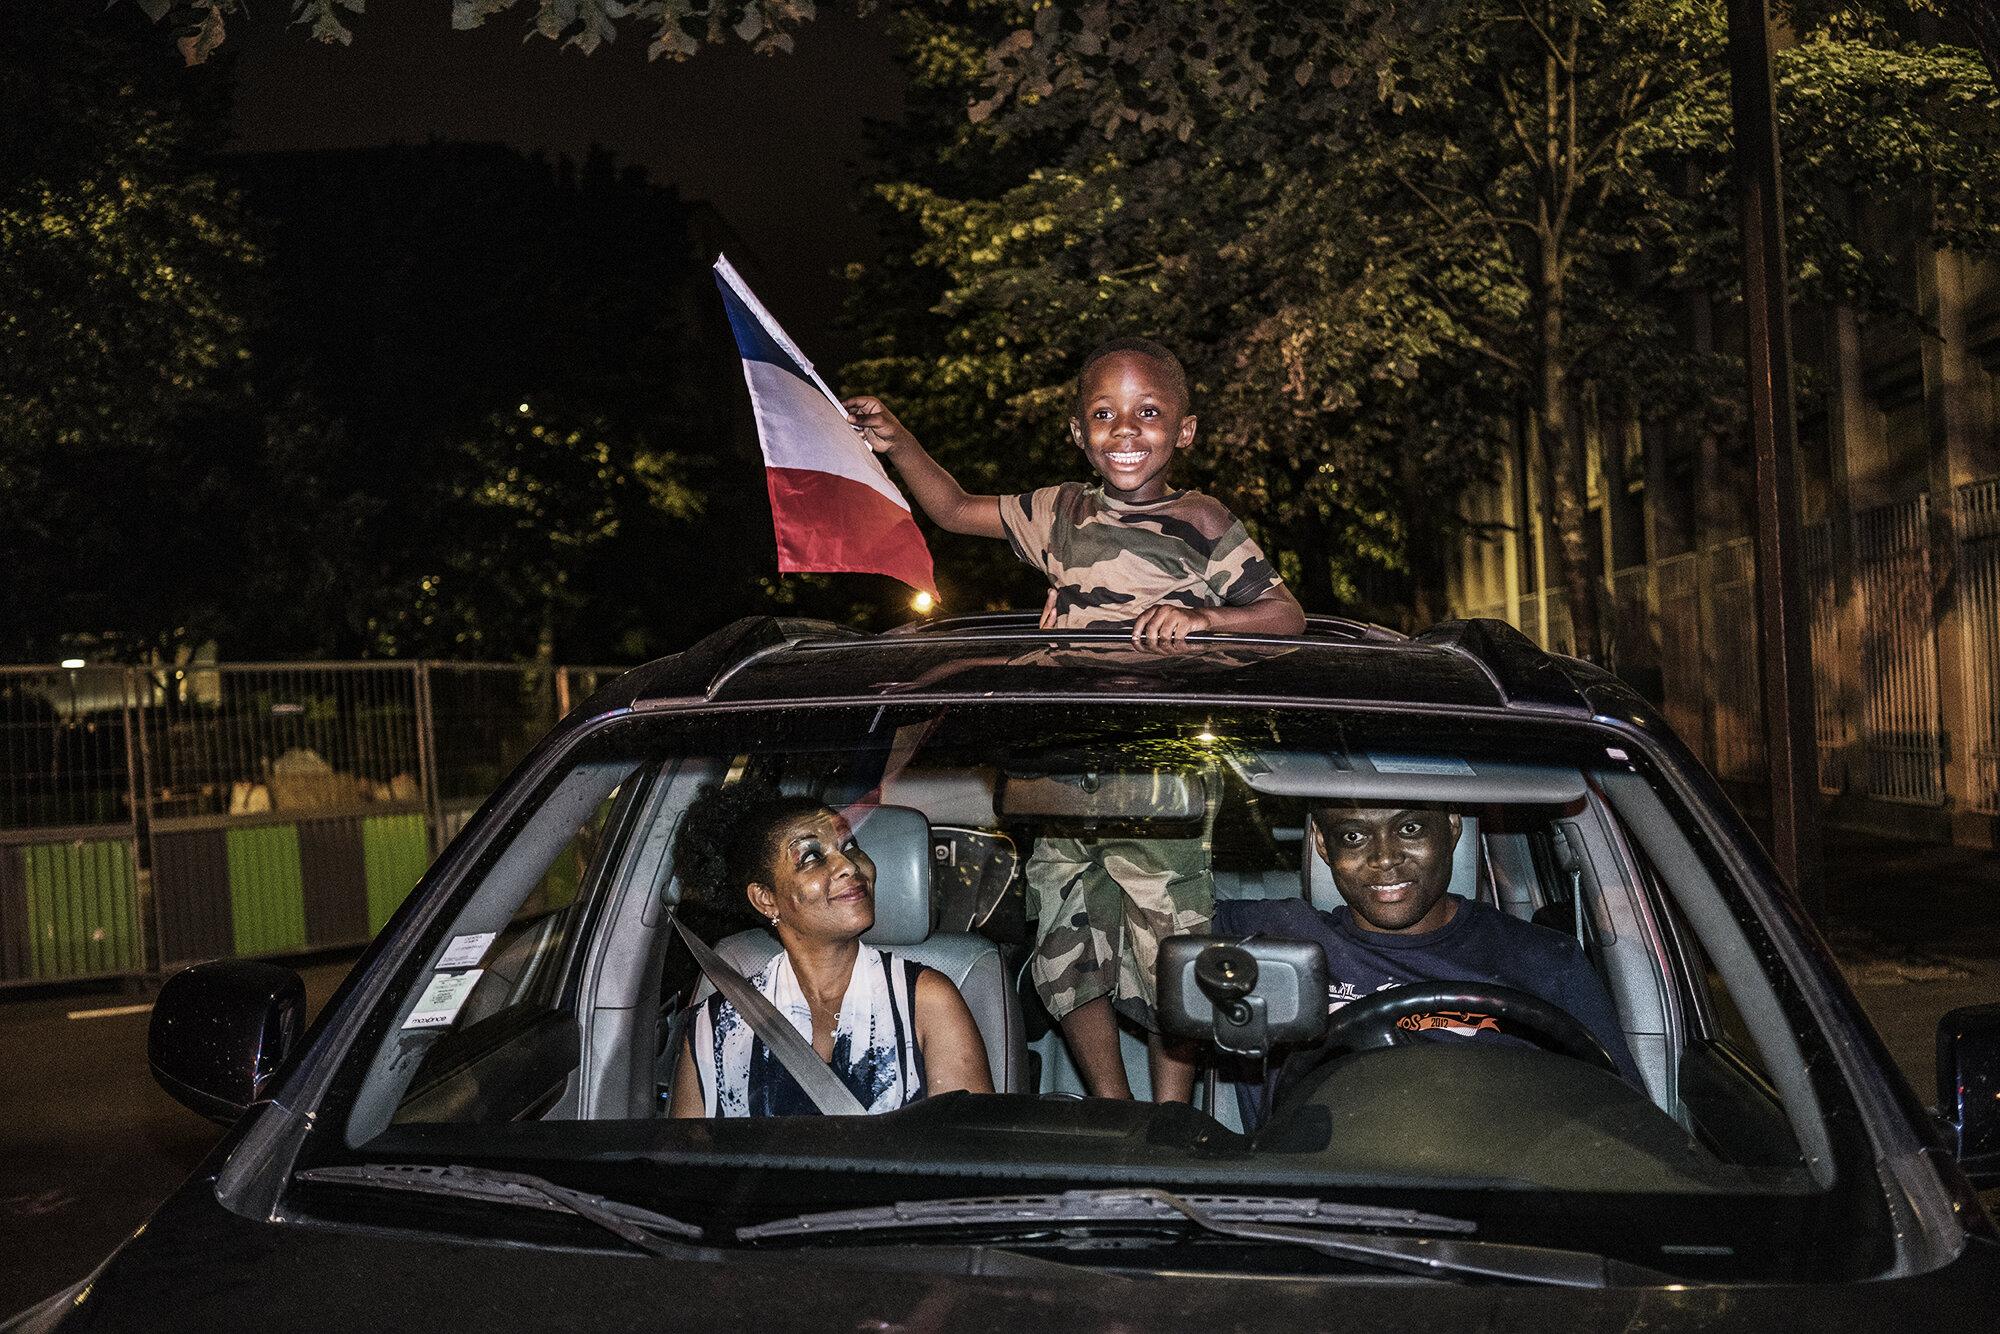 Paris_Street_2018_Young_Boy_waving_French_Flag-004.jpg